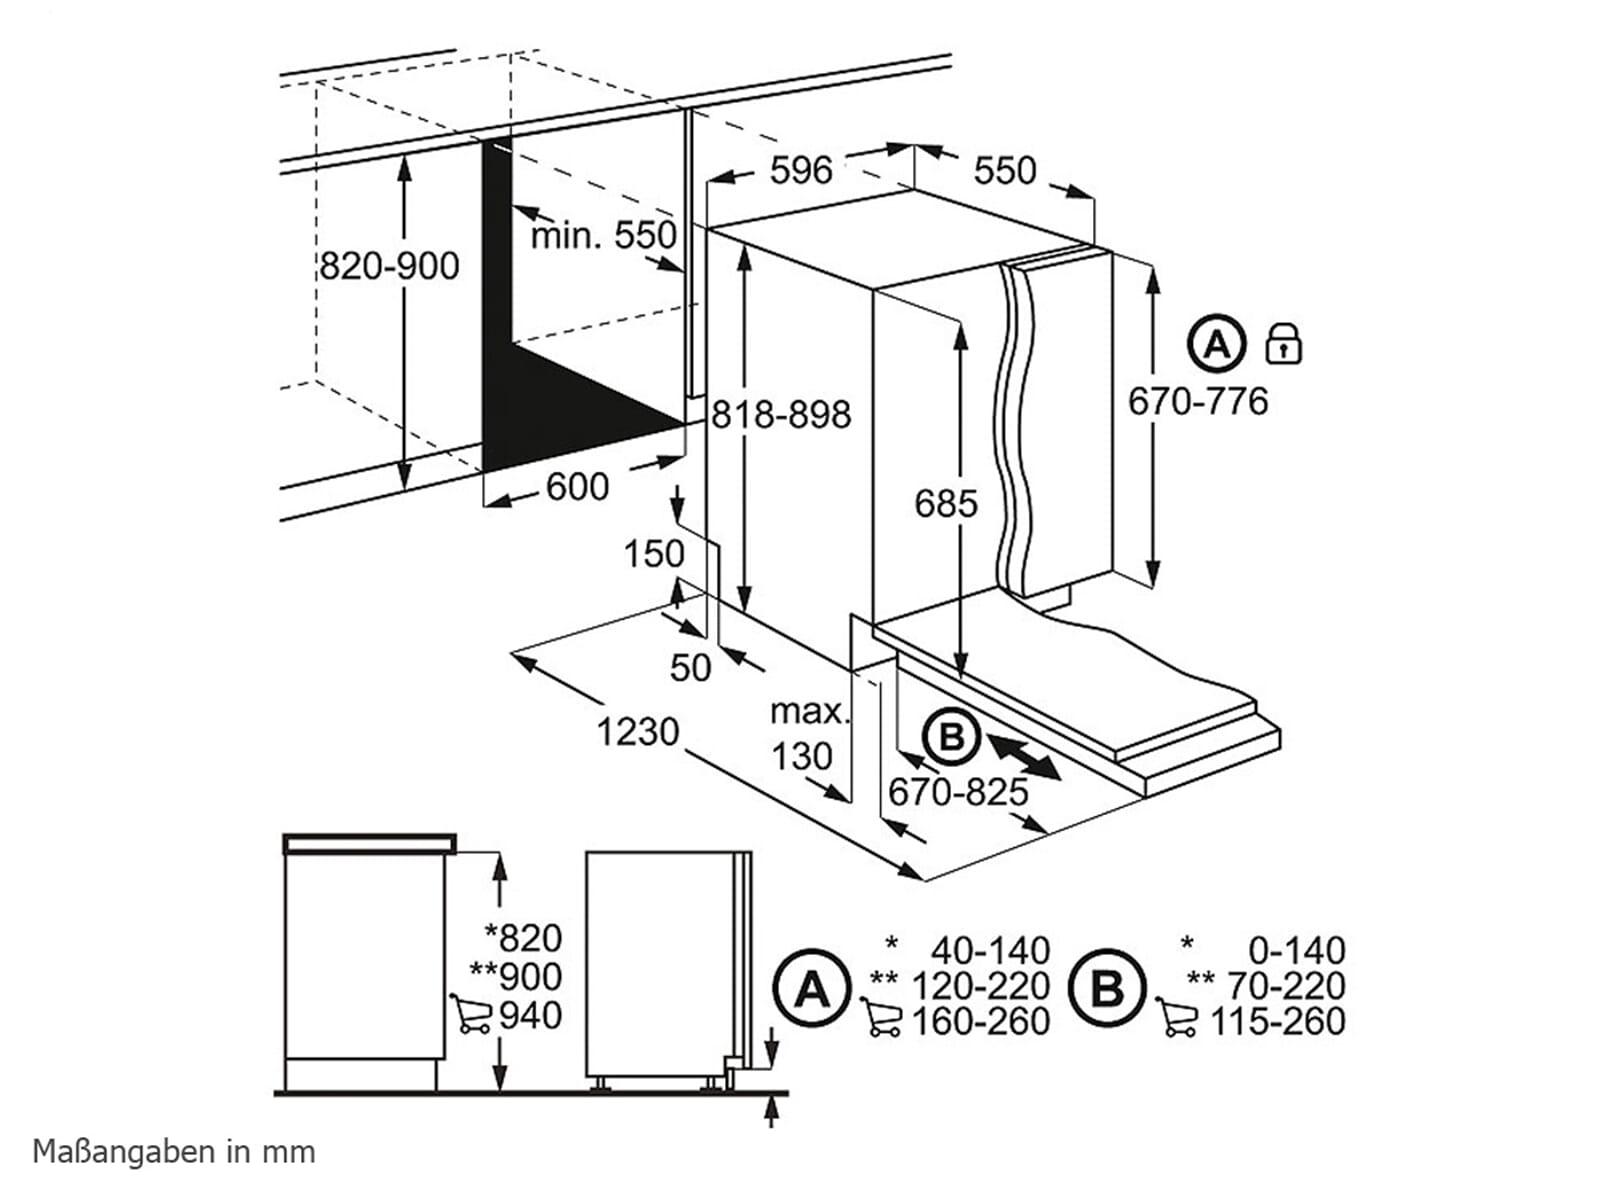 aeg fse62700p proclean vollintegrierbarer einbaugeschirrsp ler. Black Bedroom Furniture Sets. Home Design Ideas